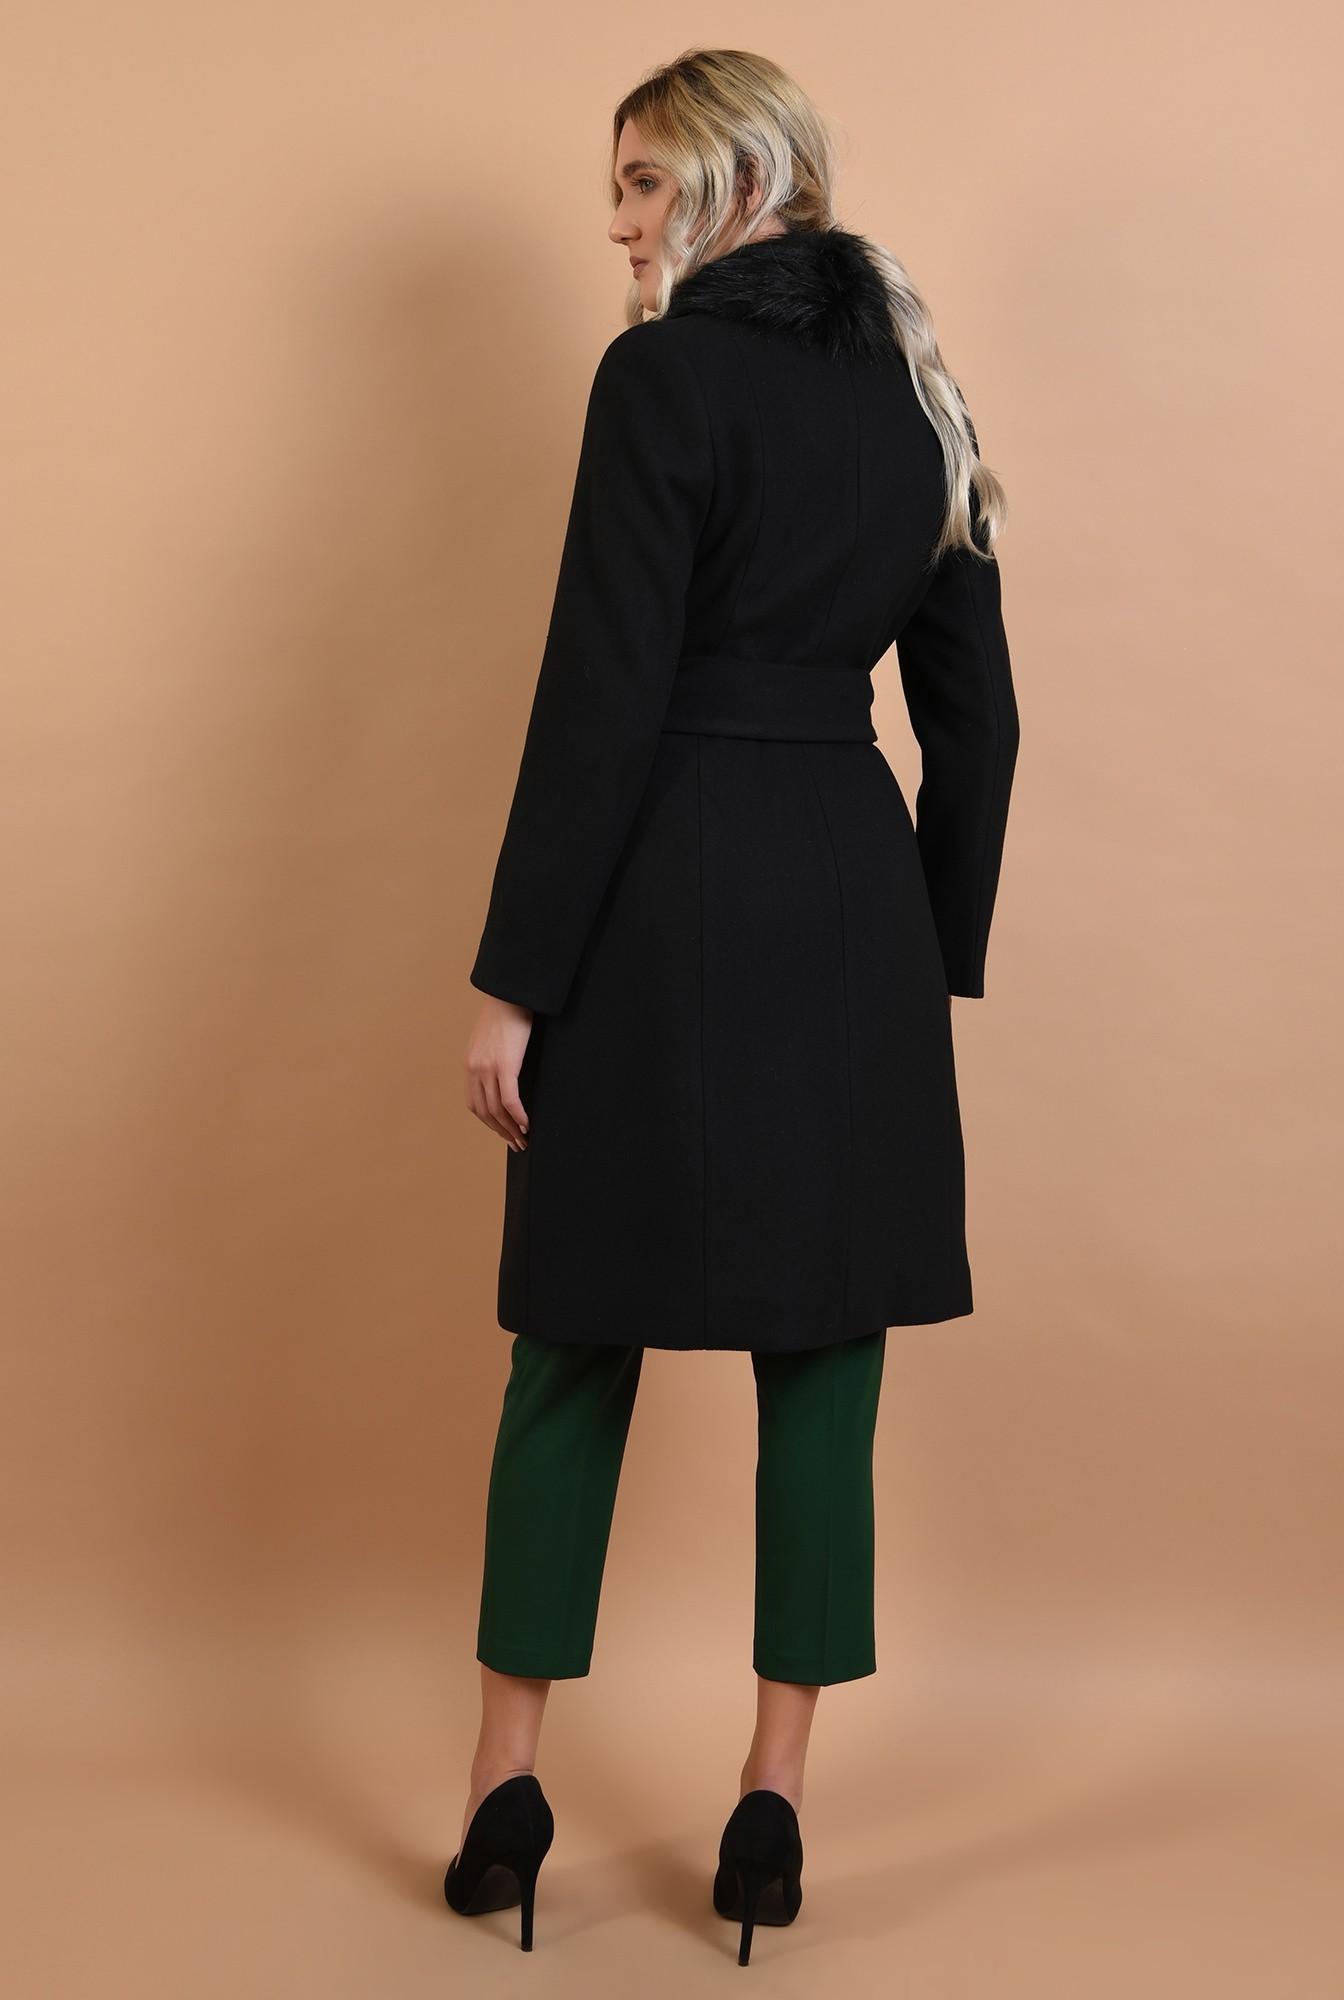 1 - palton cu blana, midi, negru, cu cordon, Poema